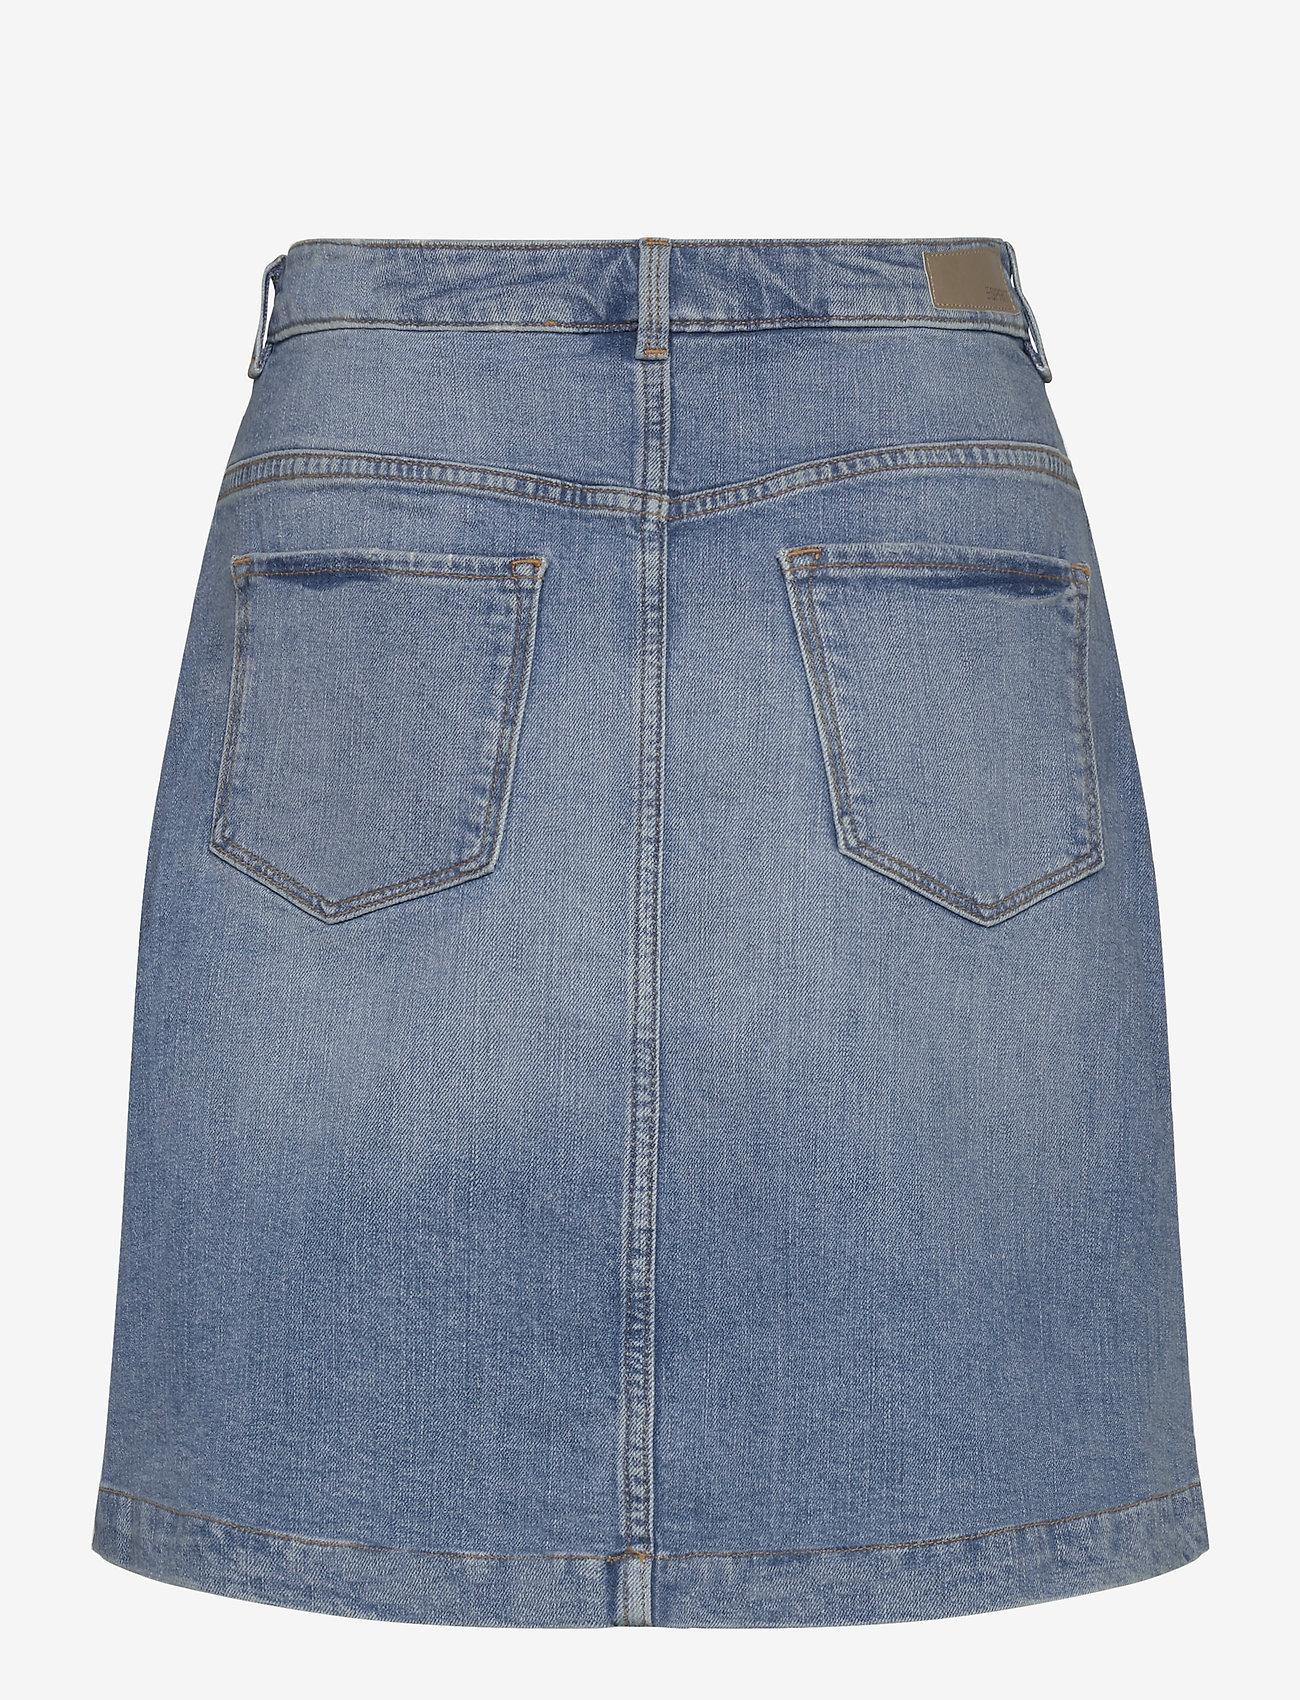 Skirts Denim (Blue Medium Wash) (349.99 kr) - Esprit Casual